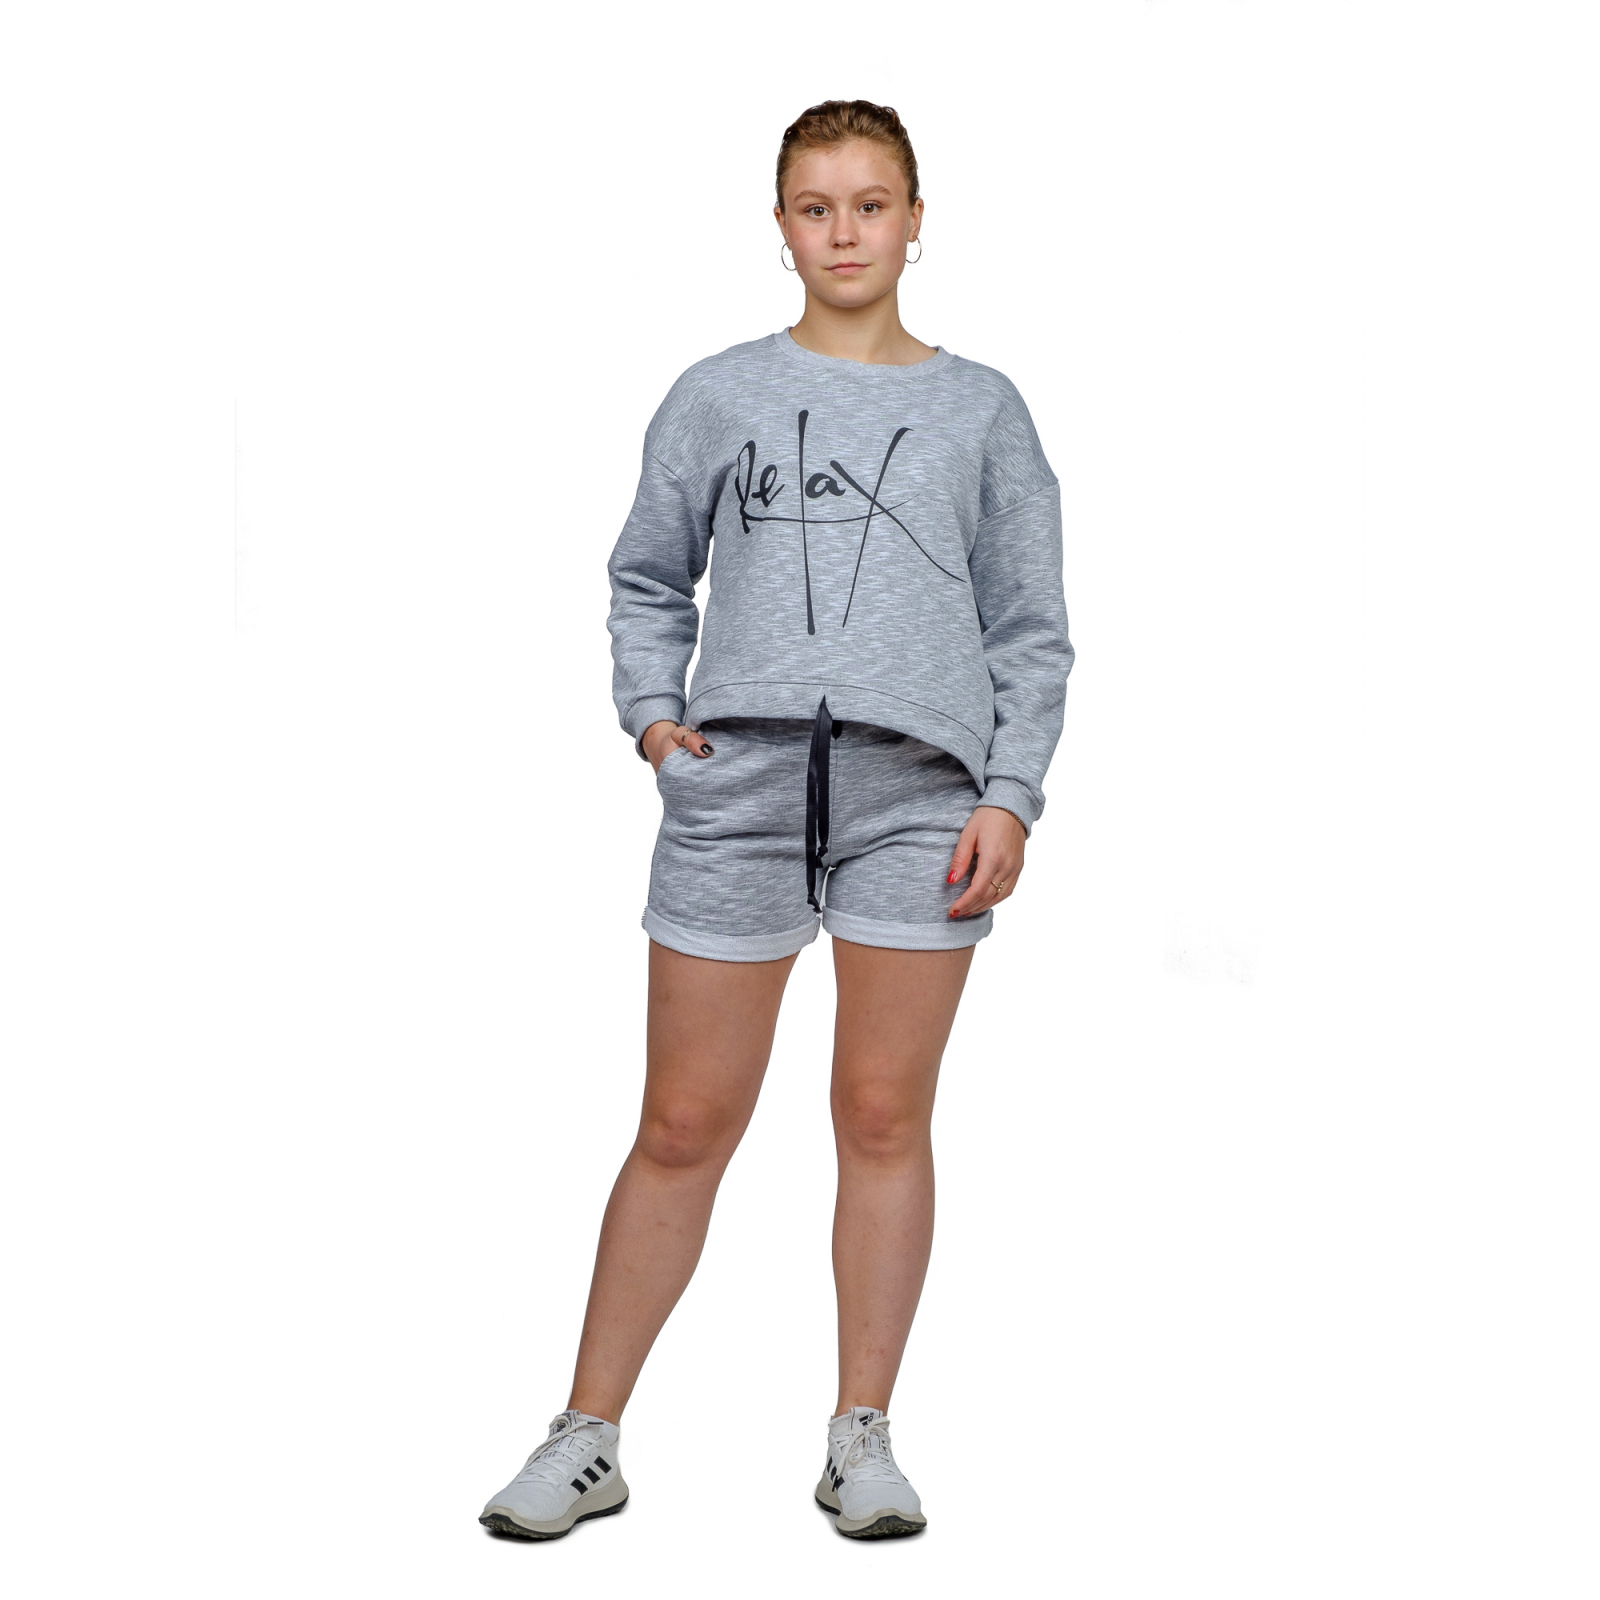 Костюм серый (футер) Релакс (шорты+кофта) М-0171СС